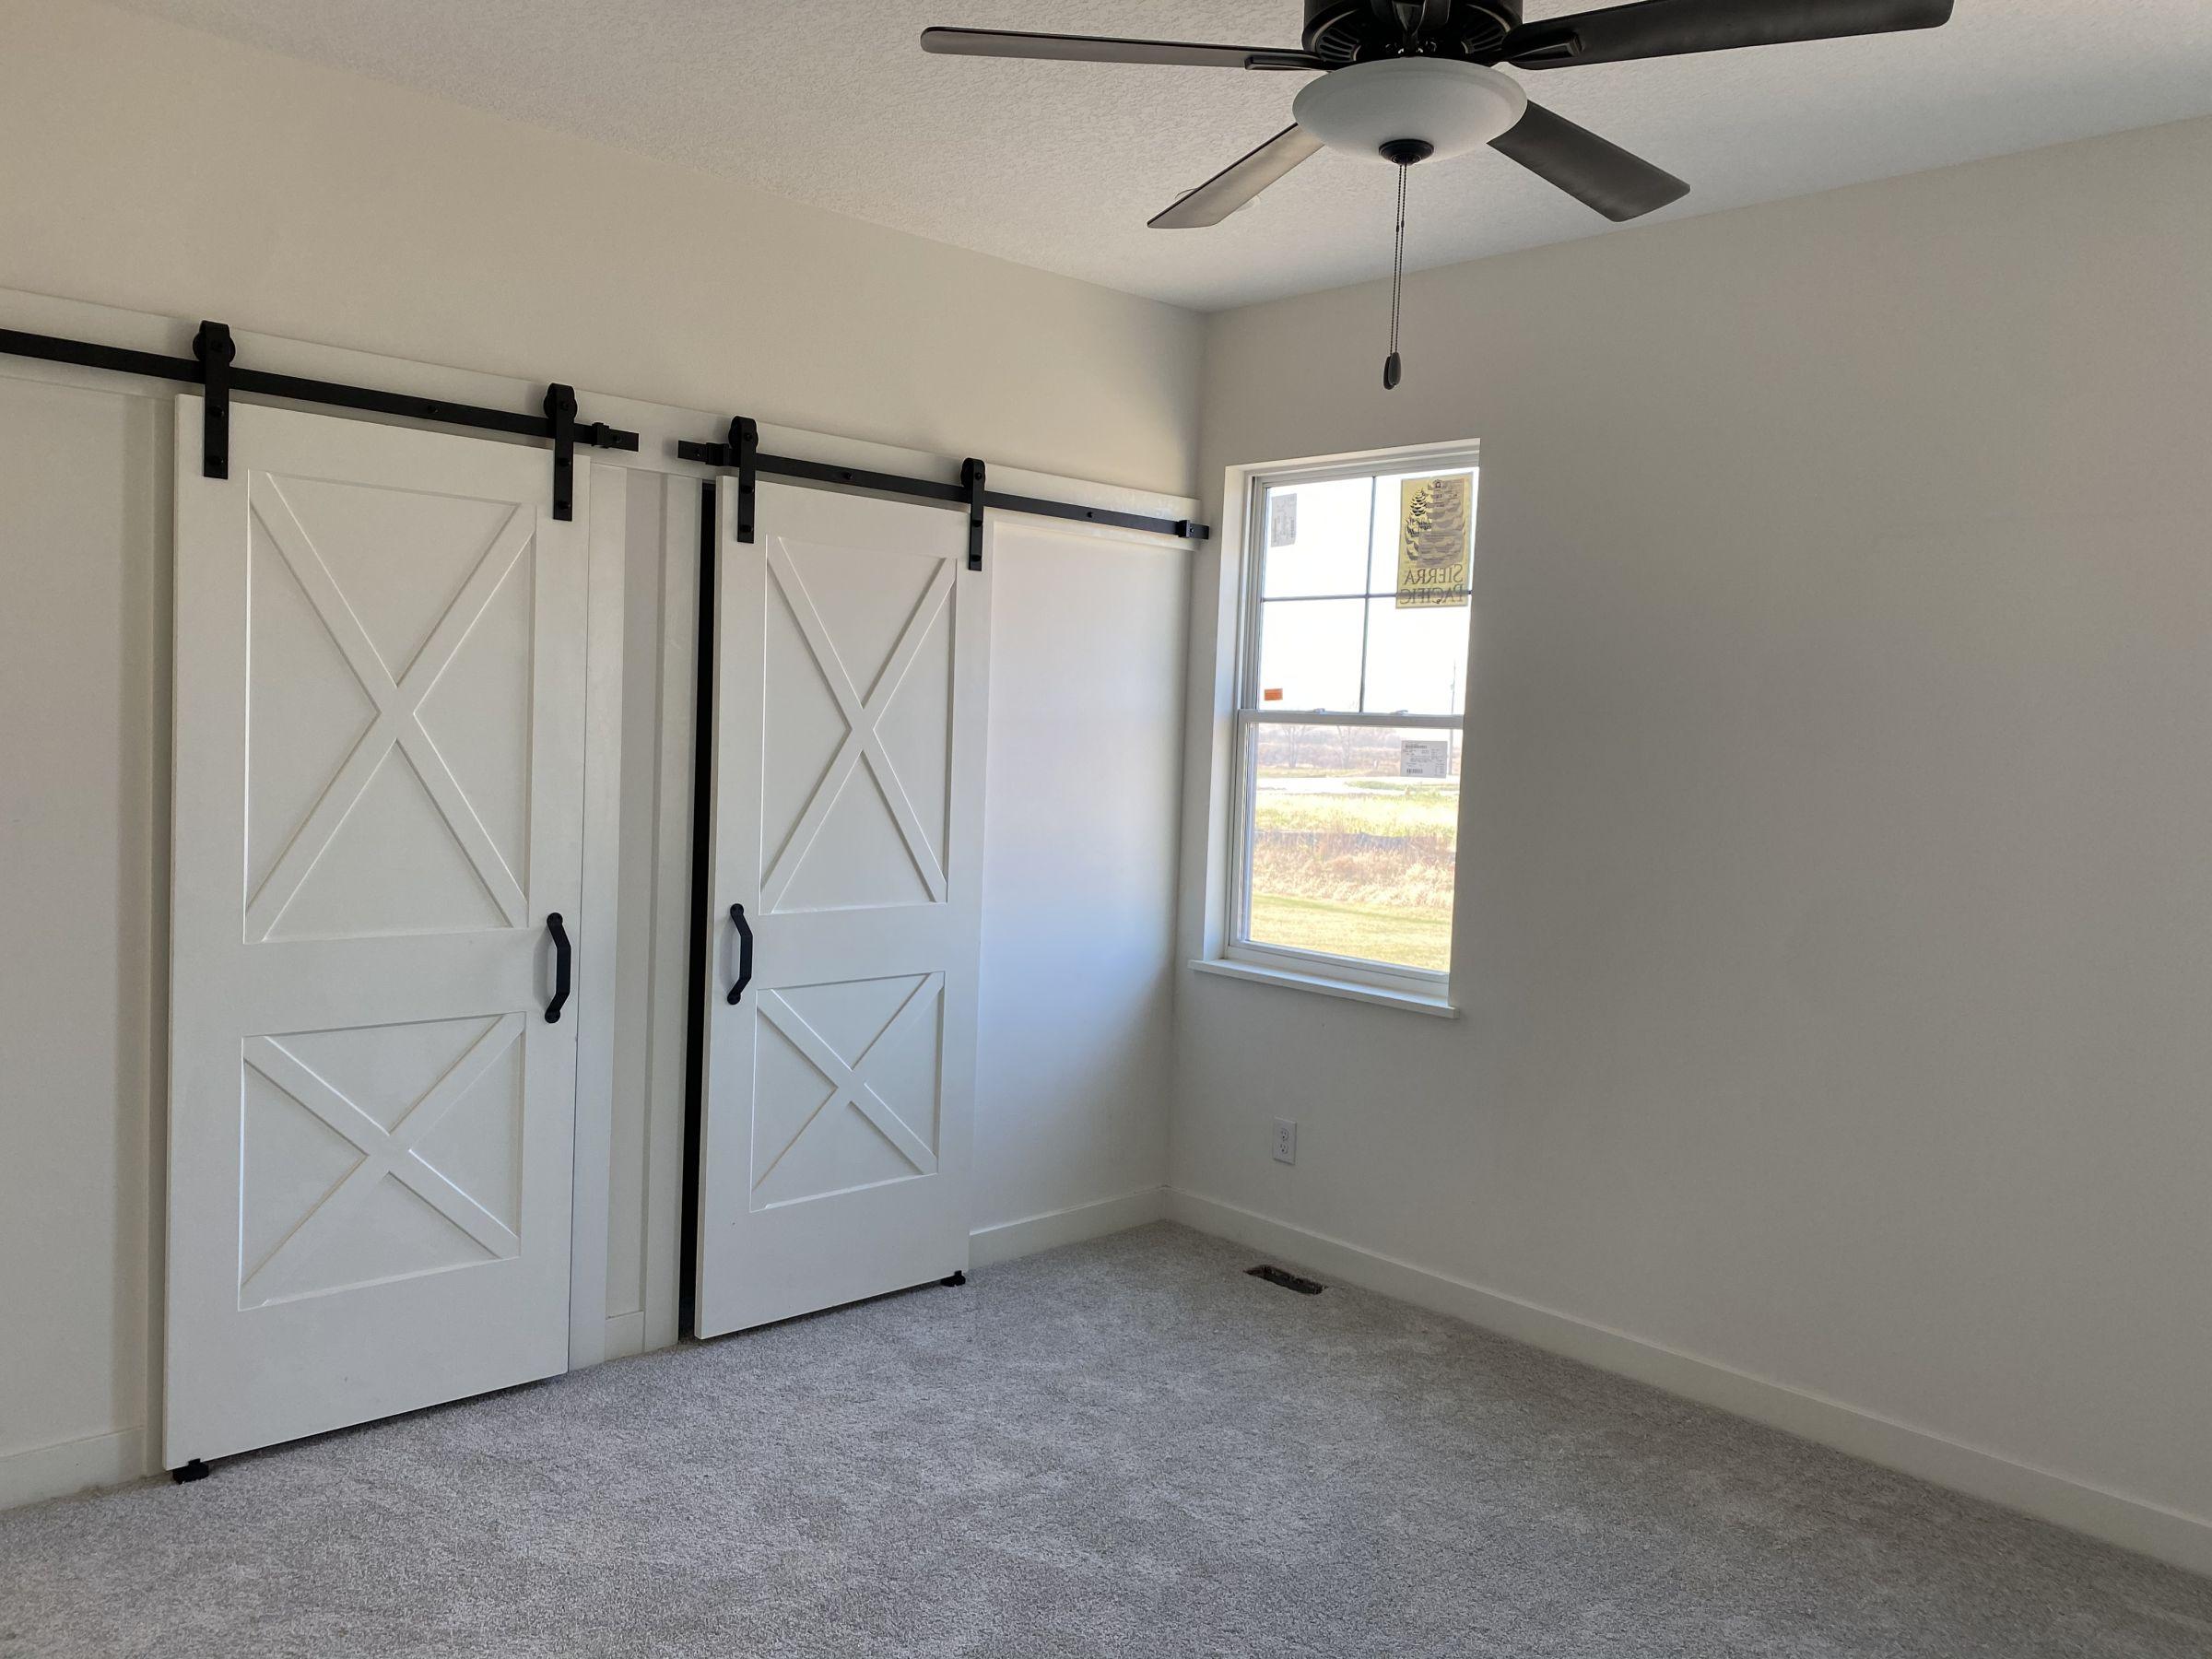 residential-warren-county-iowa-1-acres-listing-number-15096-5-2020-11-12-213556.jpg